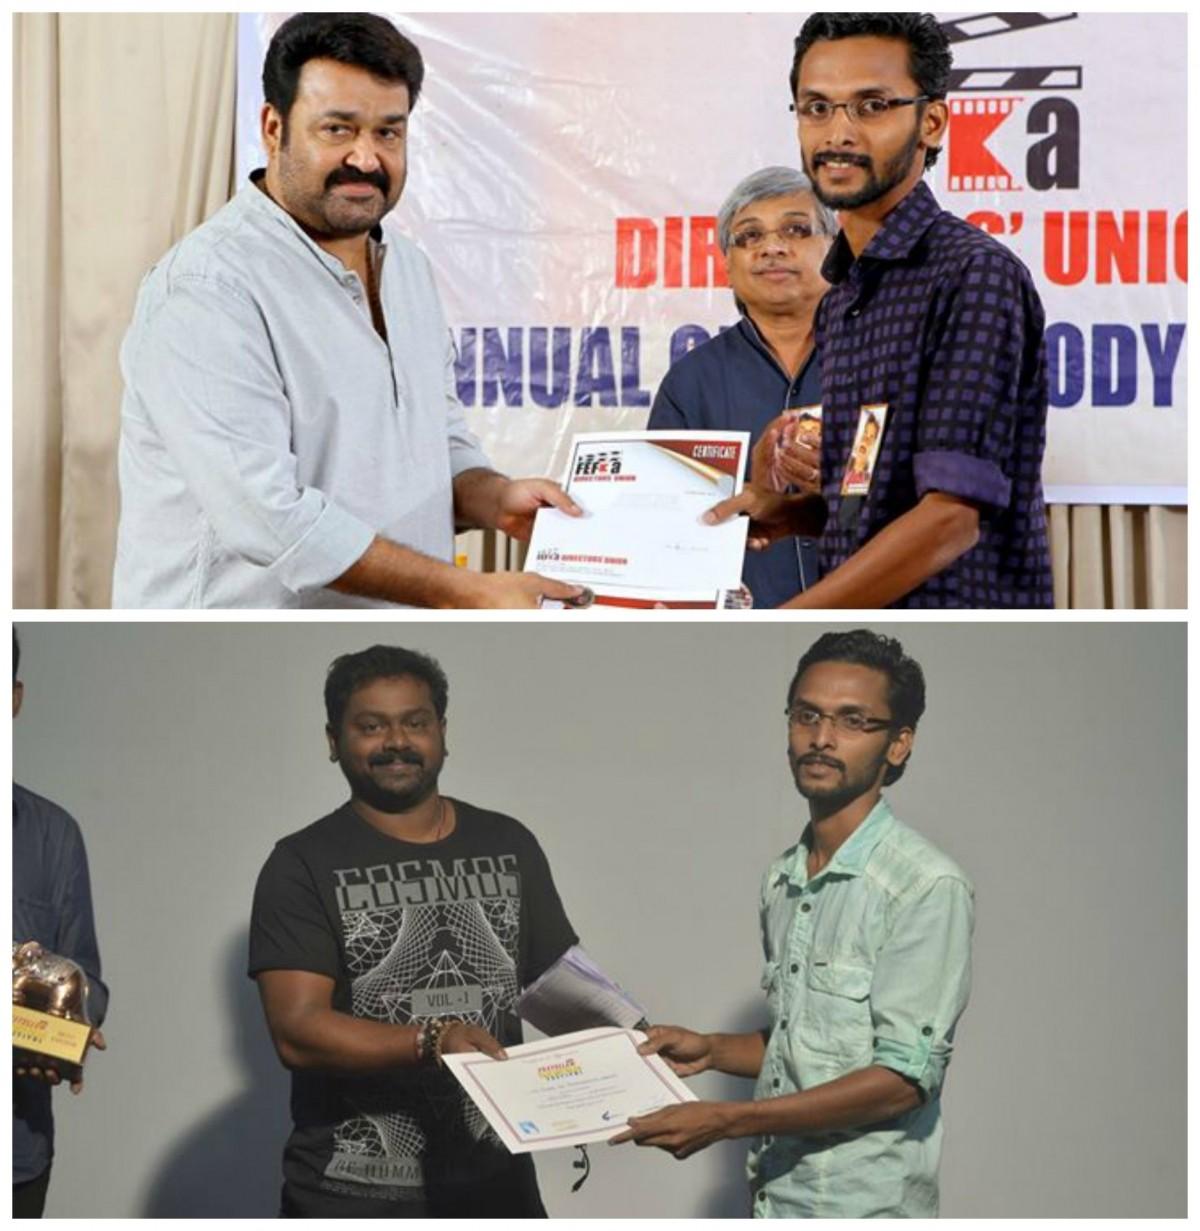 Liju Thomas receives award from Mohanlal and Saji Surendran